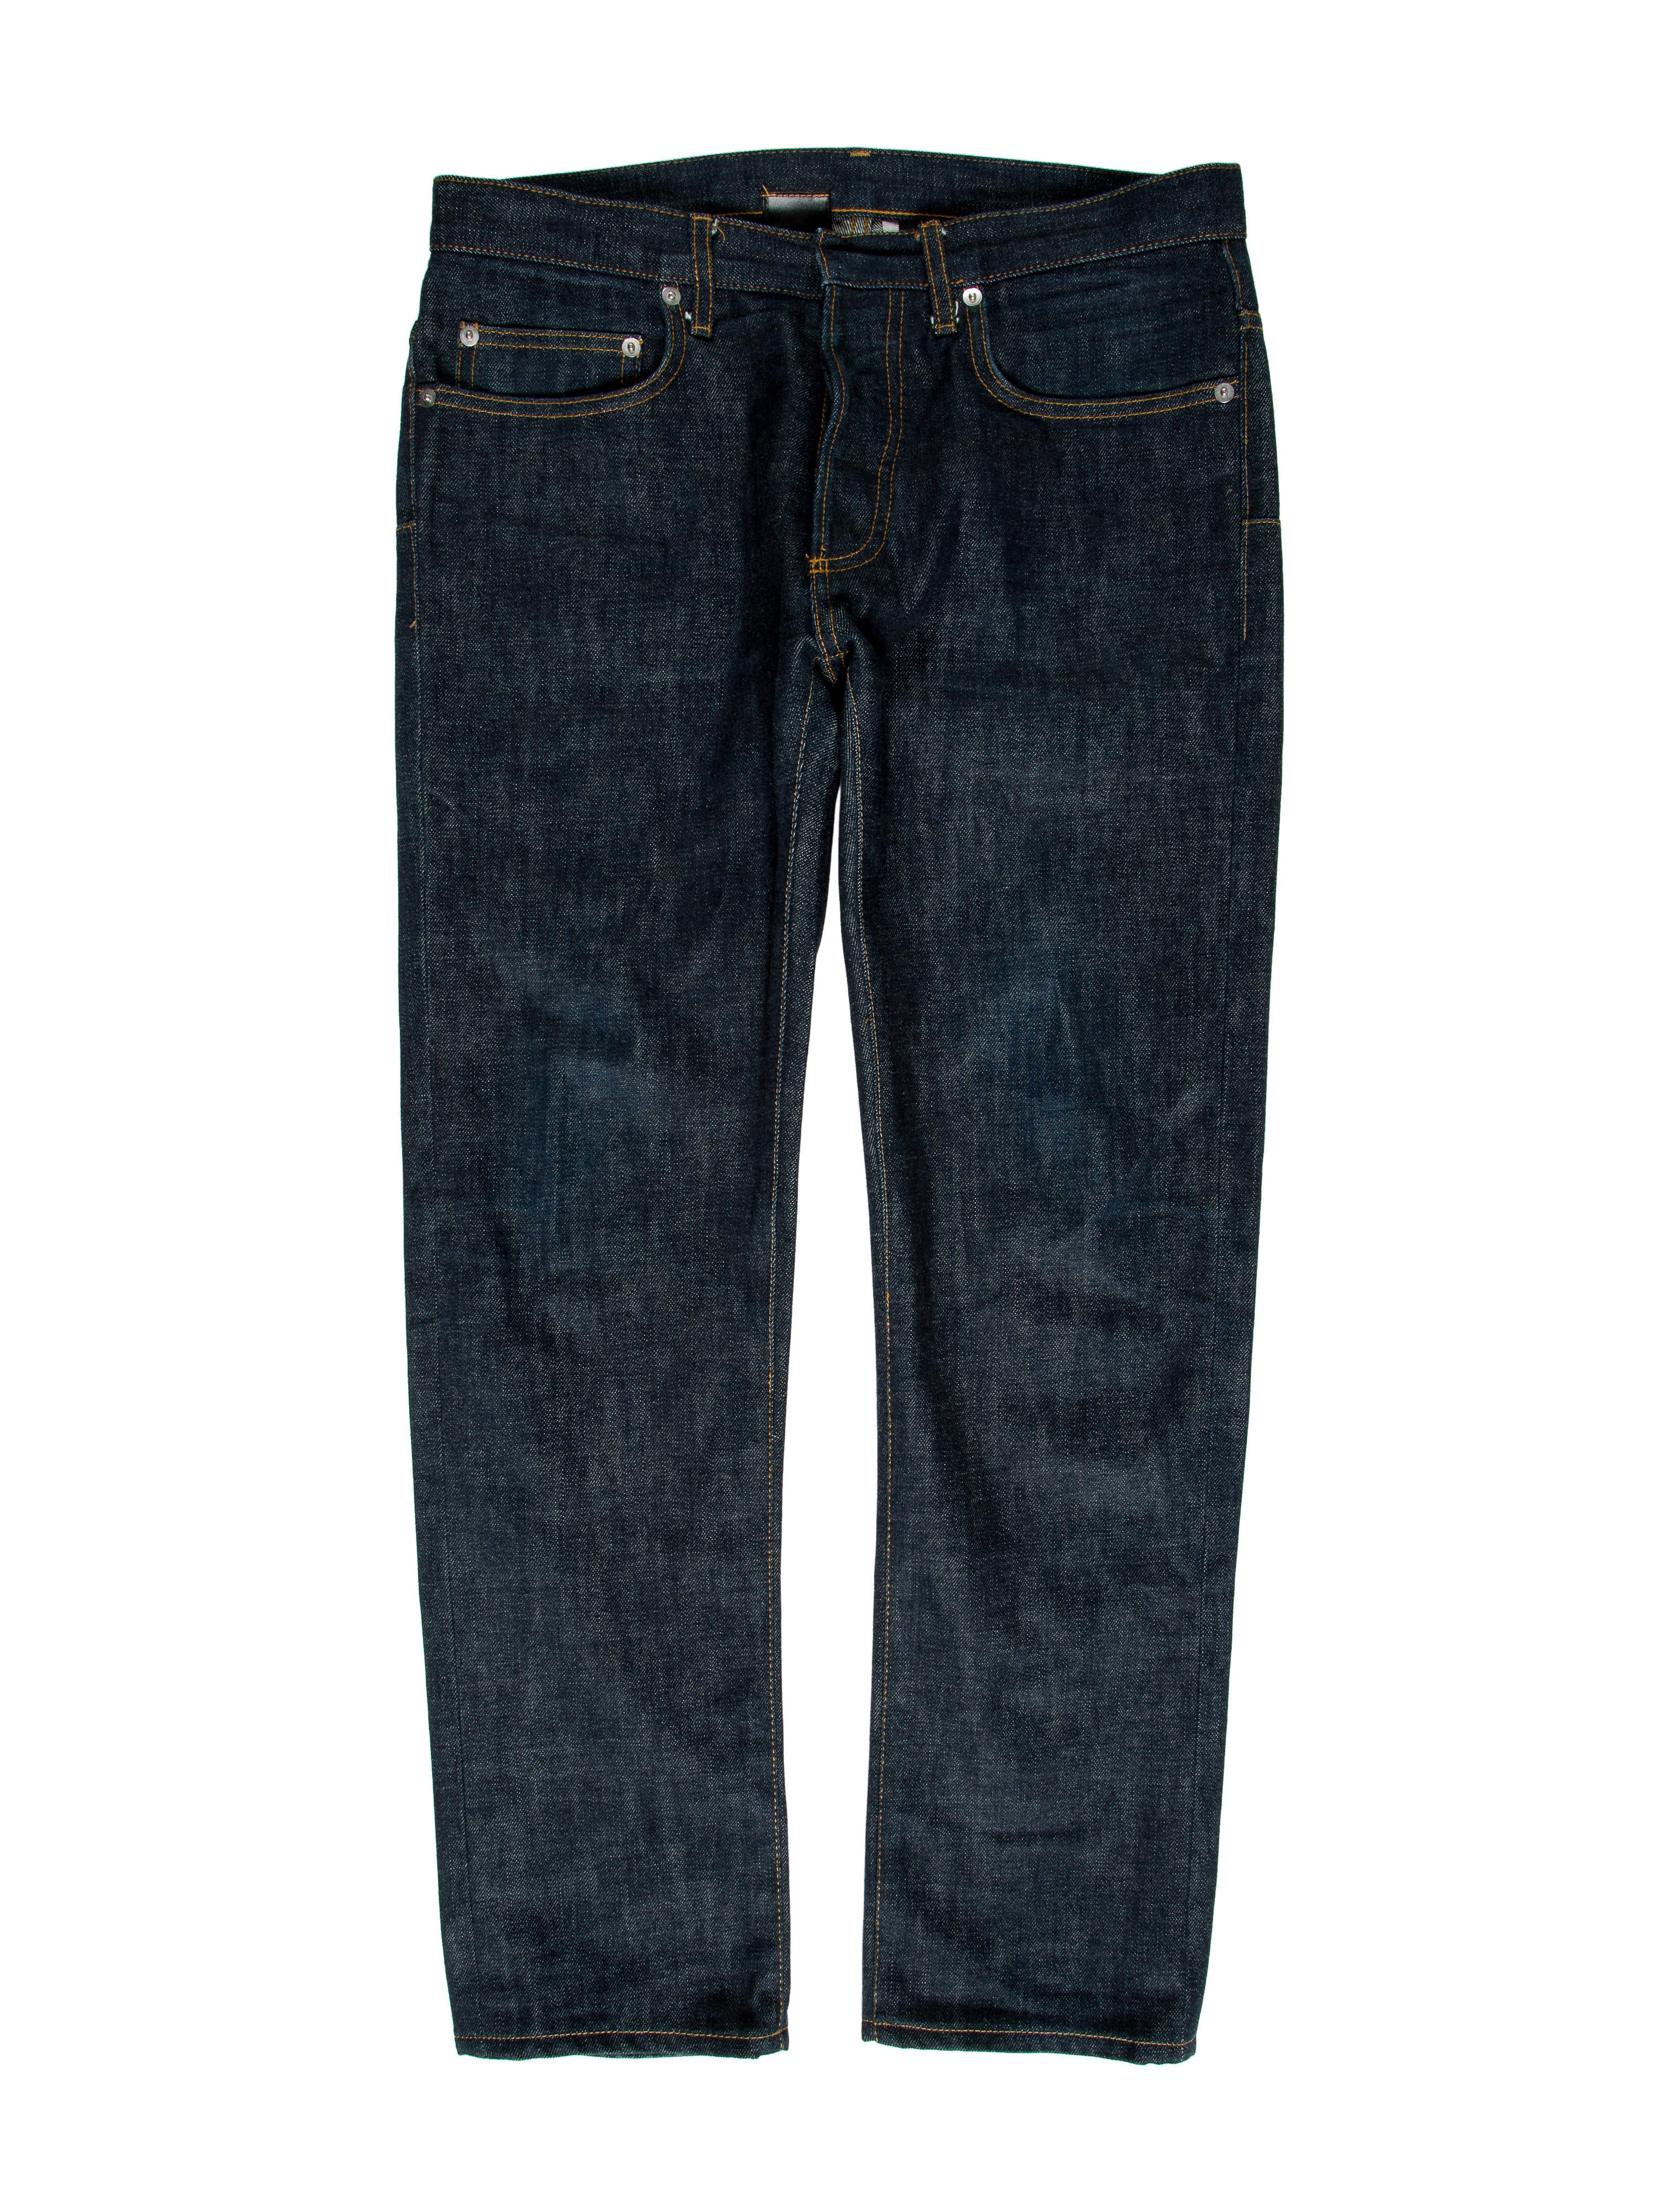 dior homme skinny jeans clothing hmm22892 the realreal. Black Bedroom Furniture Sets. Home Design Ideas